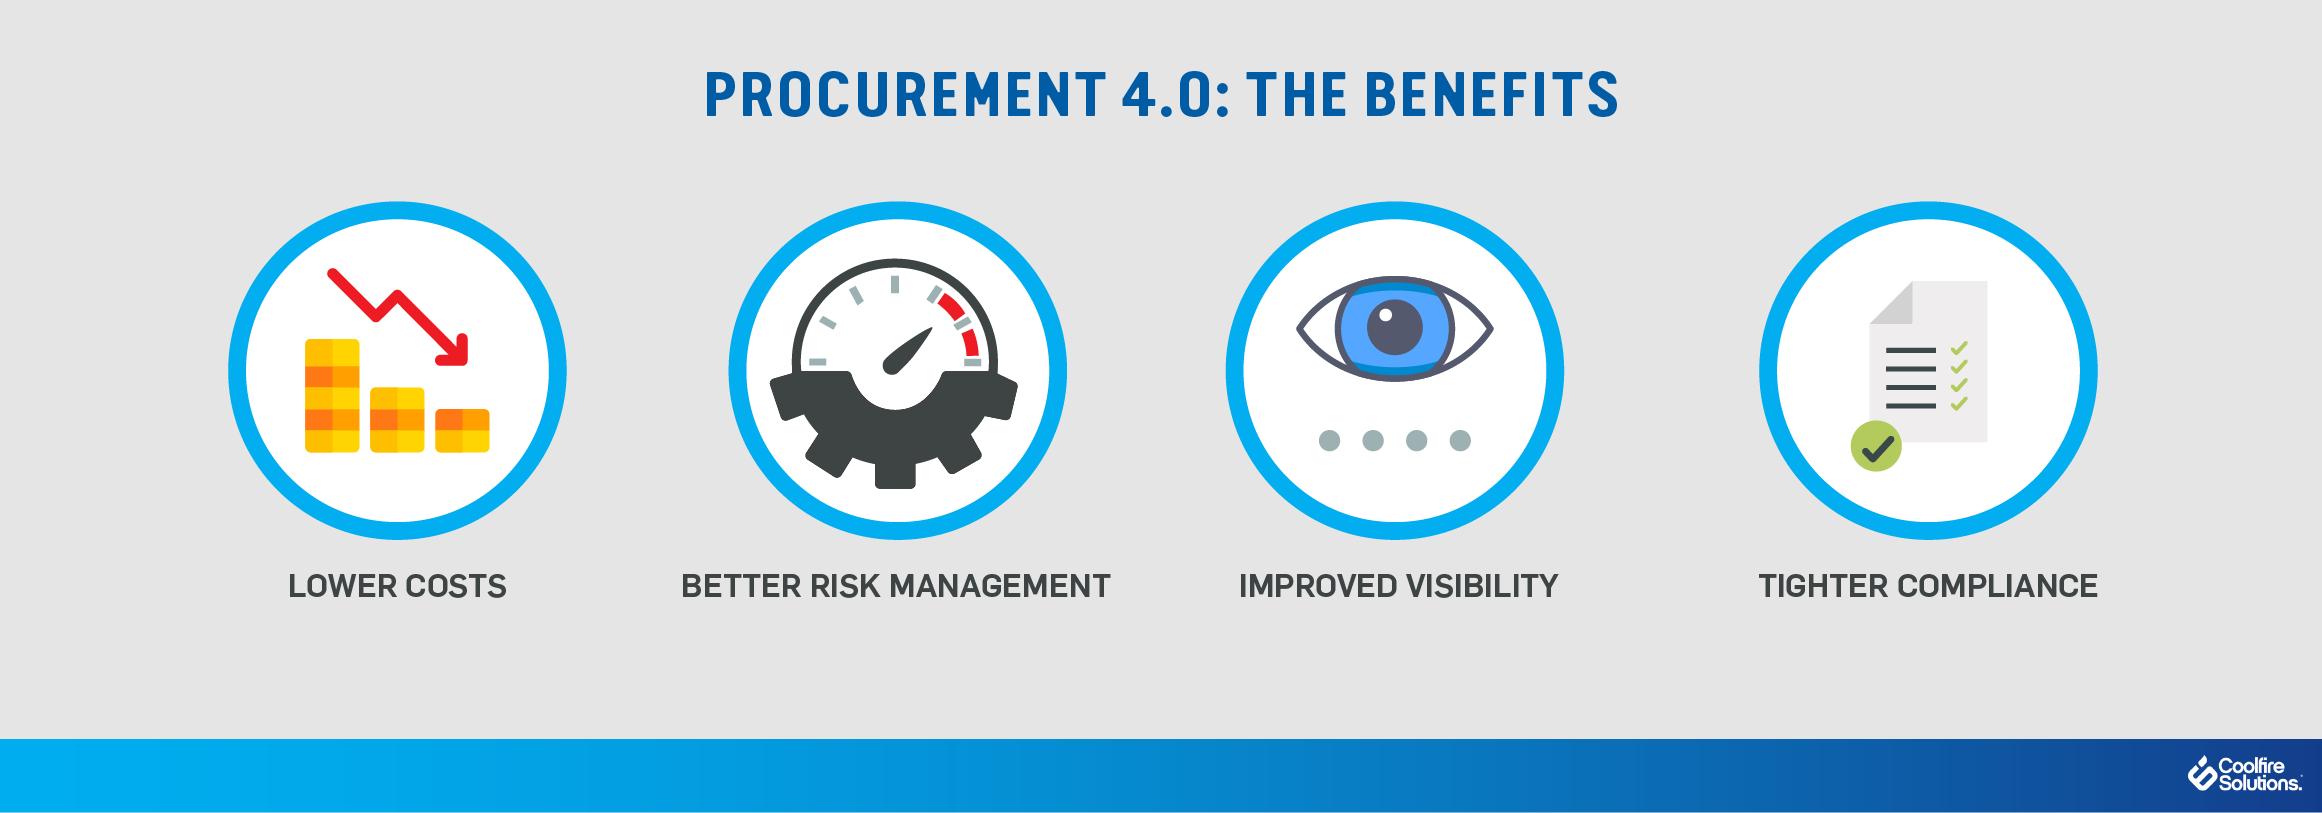 procurement benefits